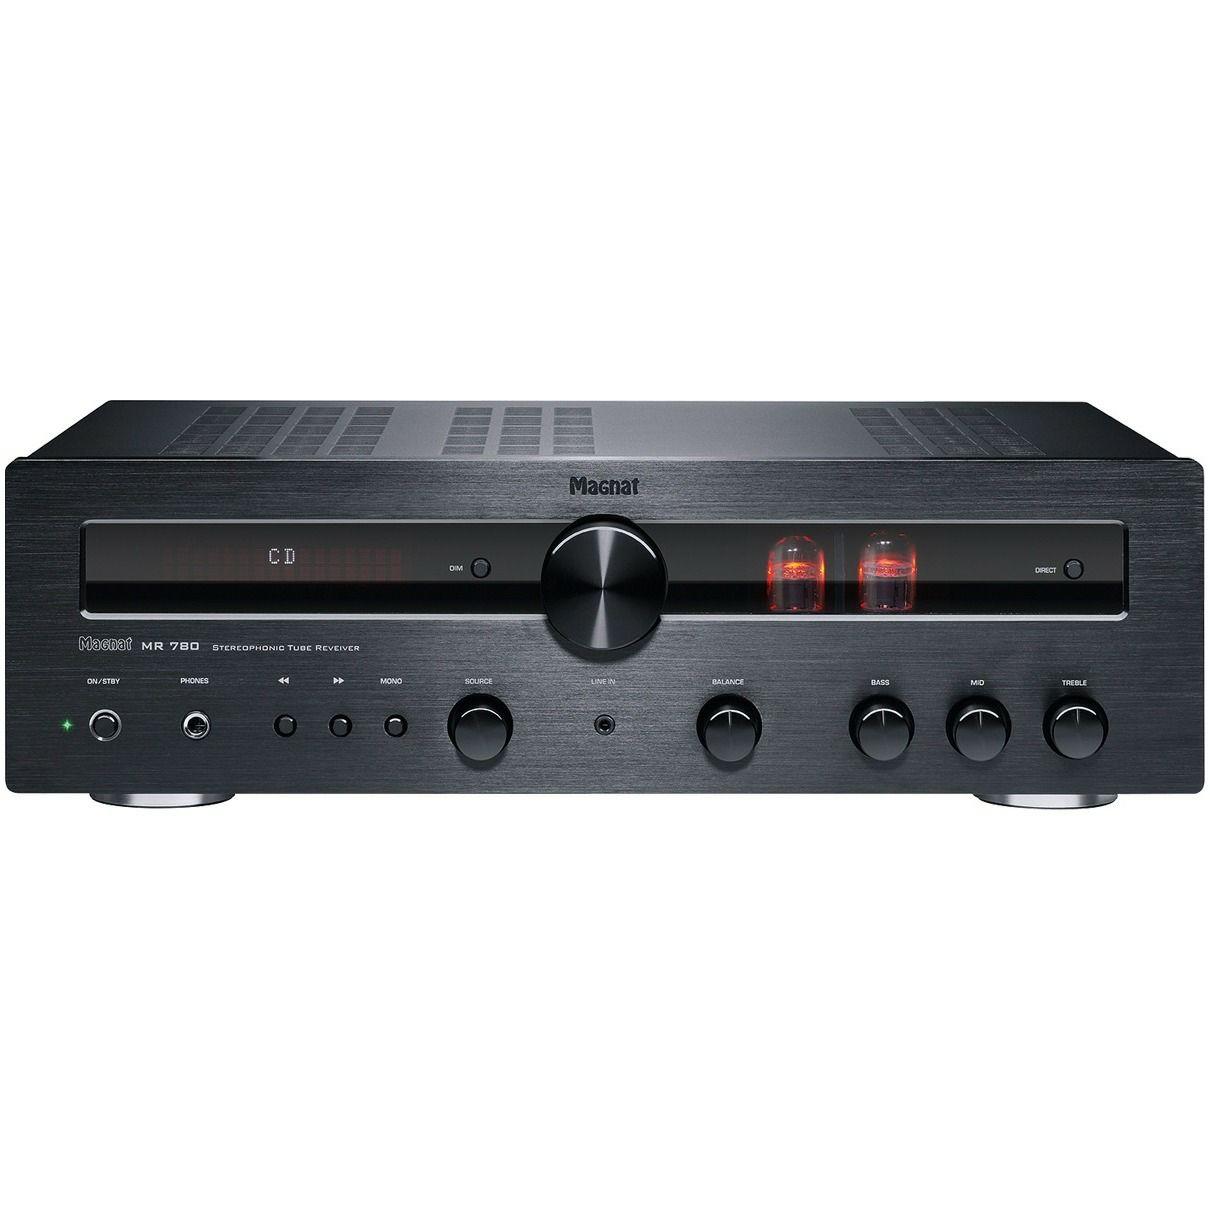 Magnat MR 780: Stereo-Receiver (2x 100W / 4 Ohm, Bluetooth, DAB+, USB, Röhren-Vorstufe)